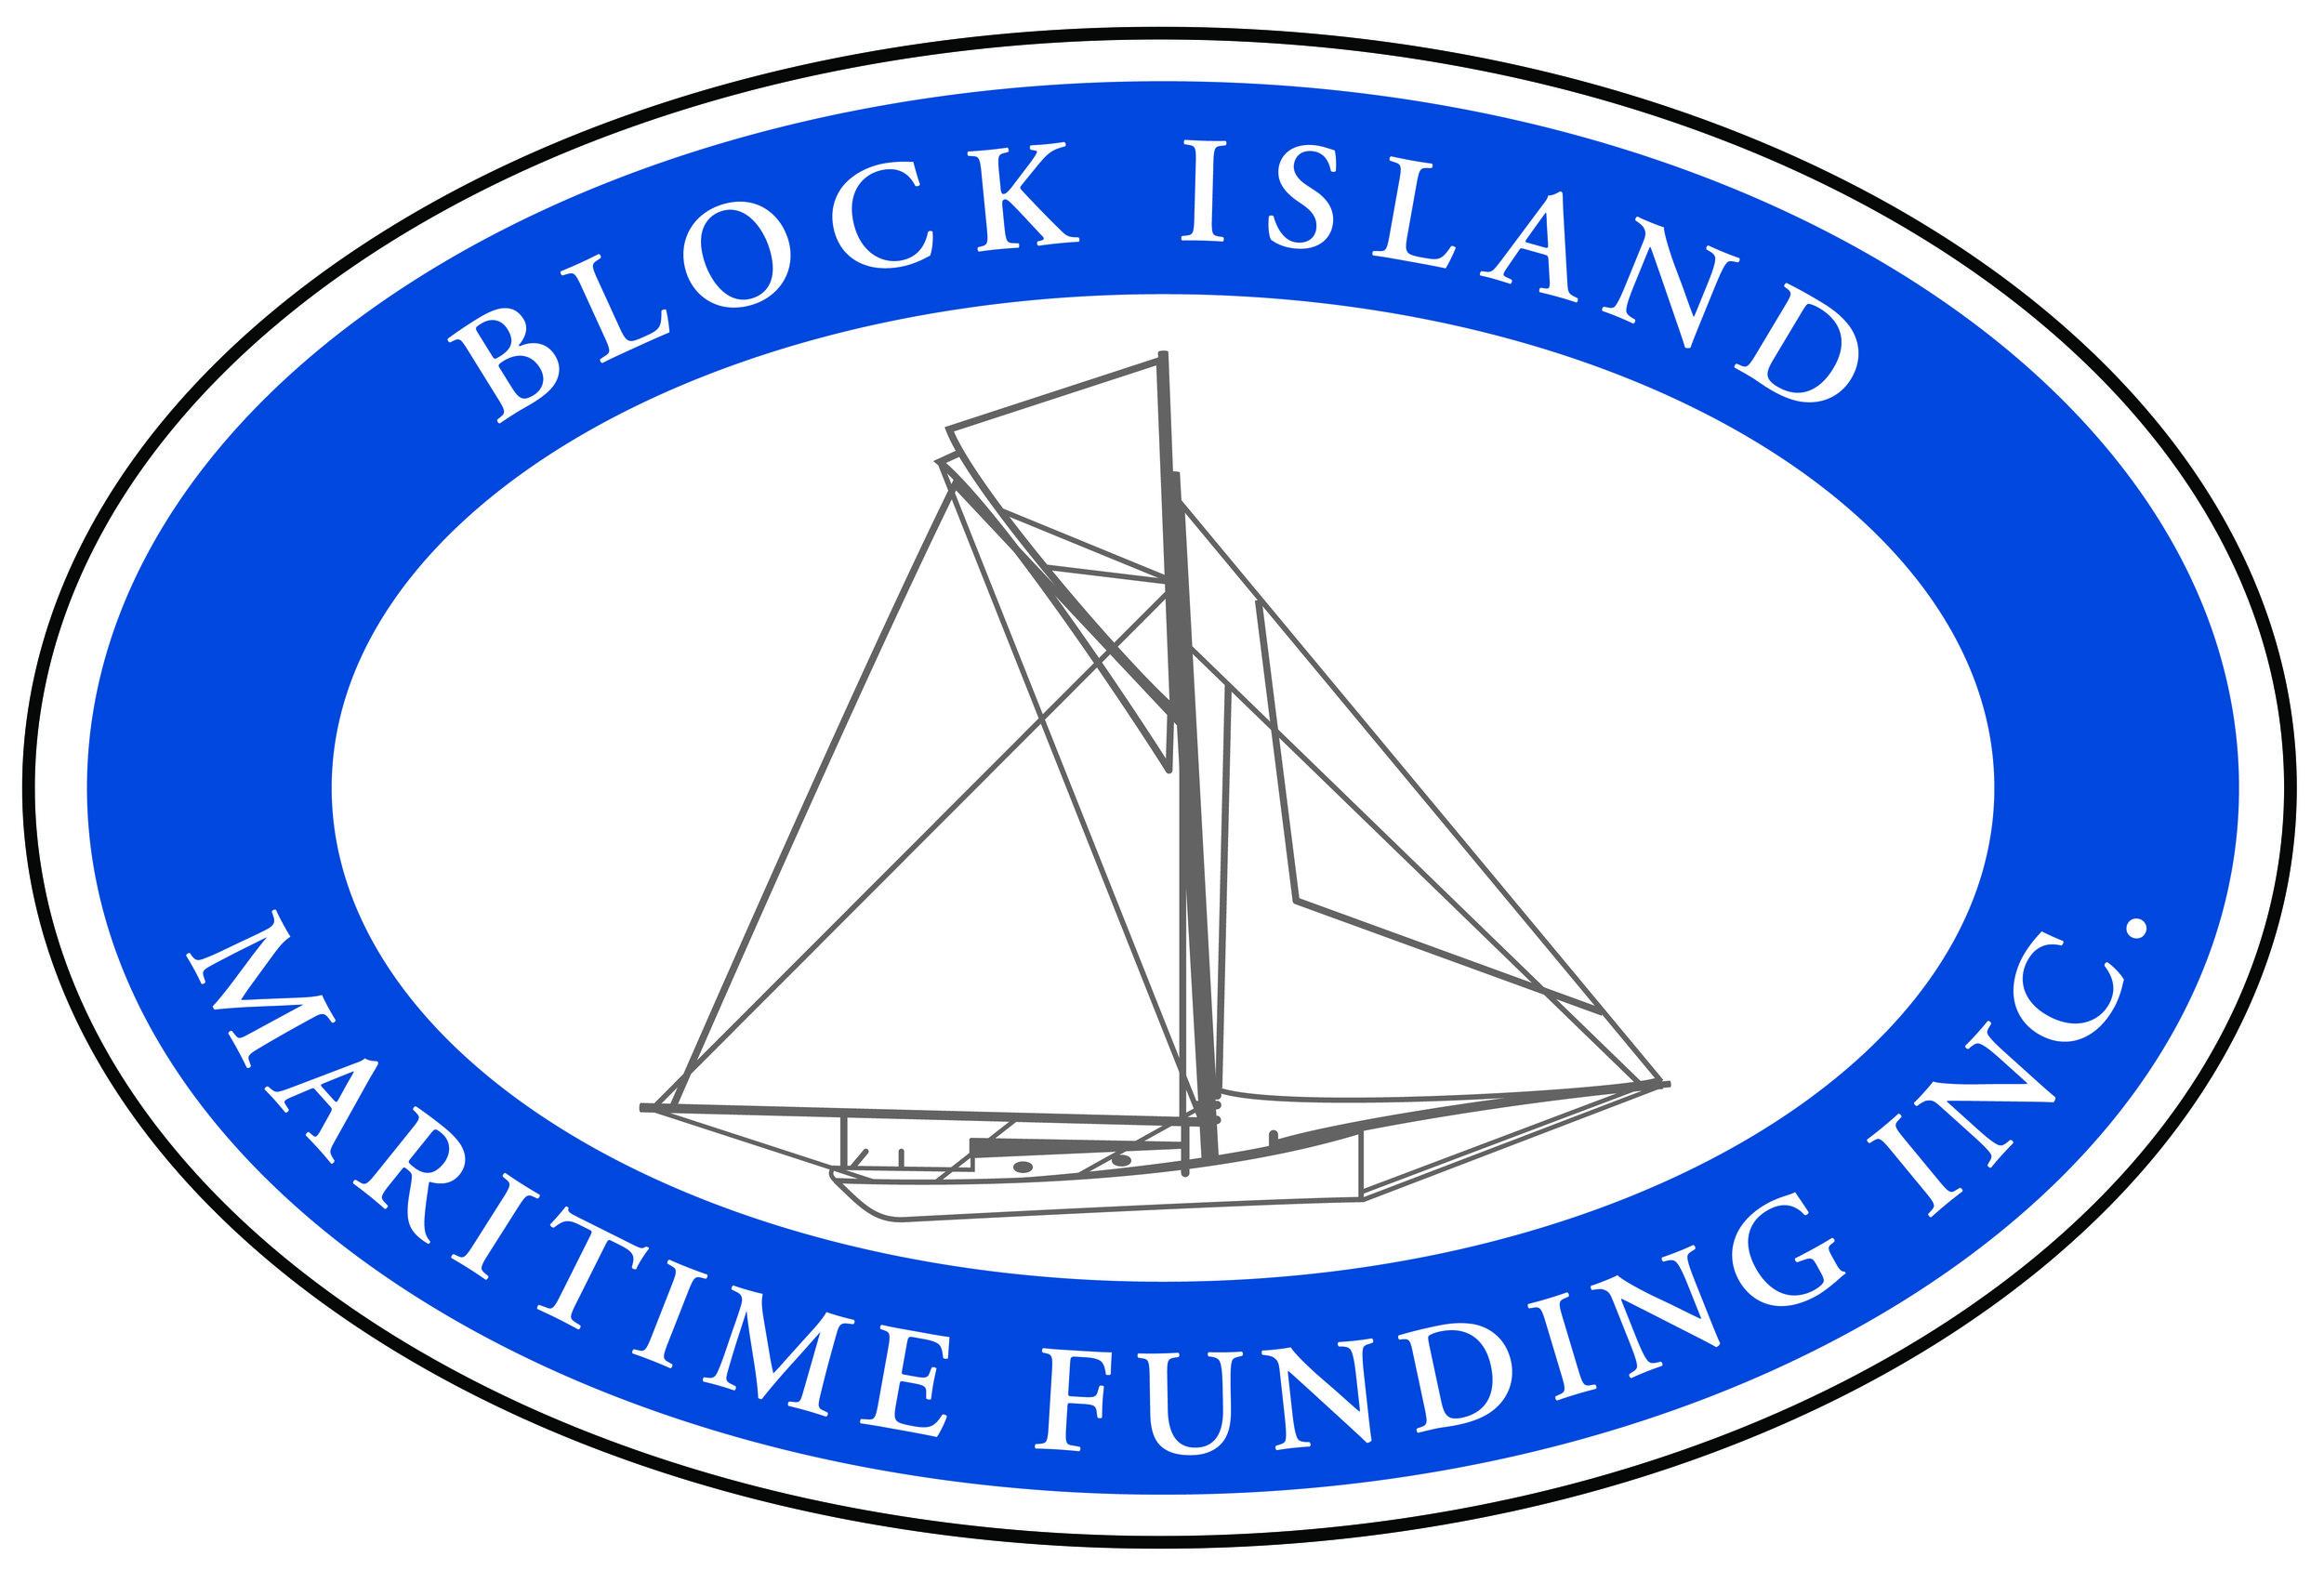 BIMF_Logo_080117a Edited.jpg